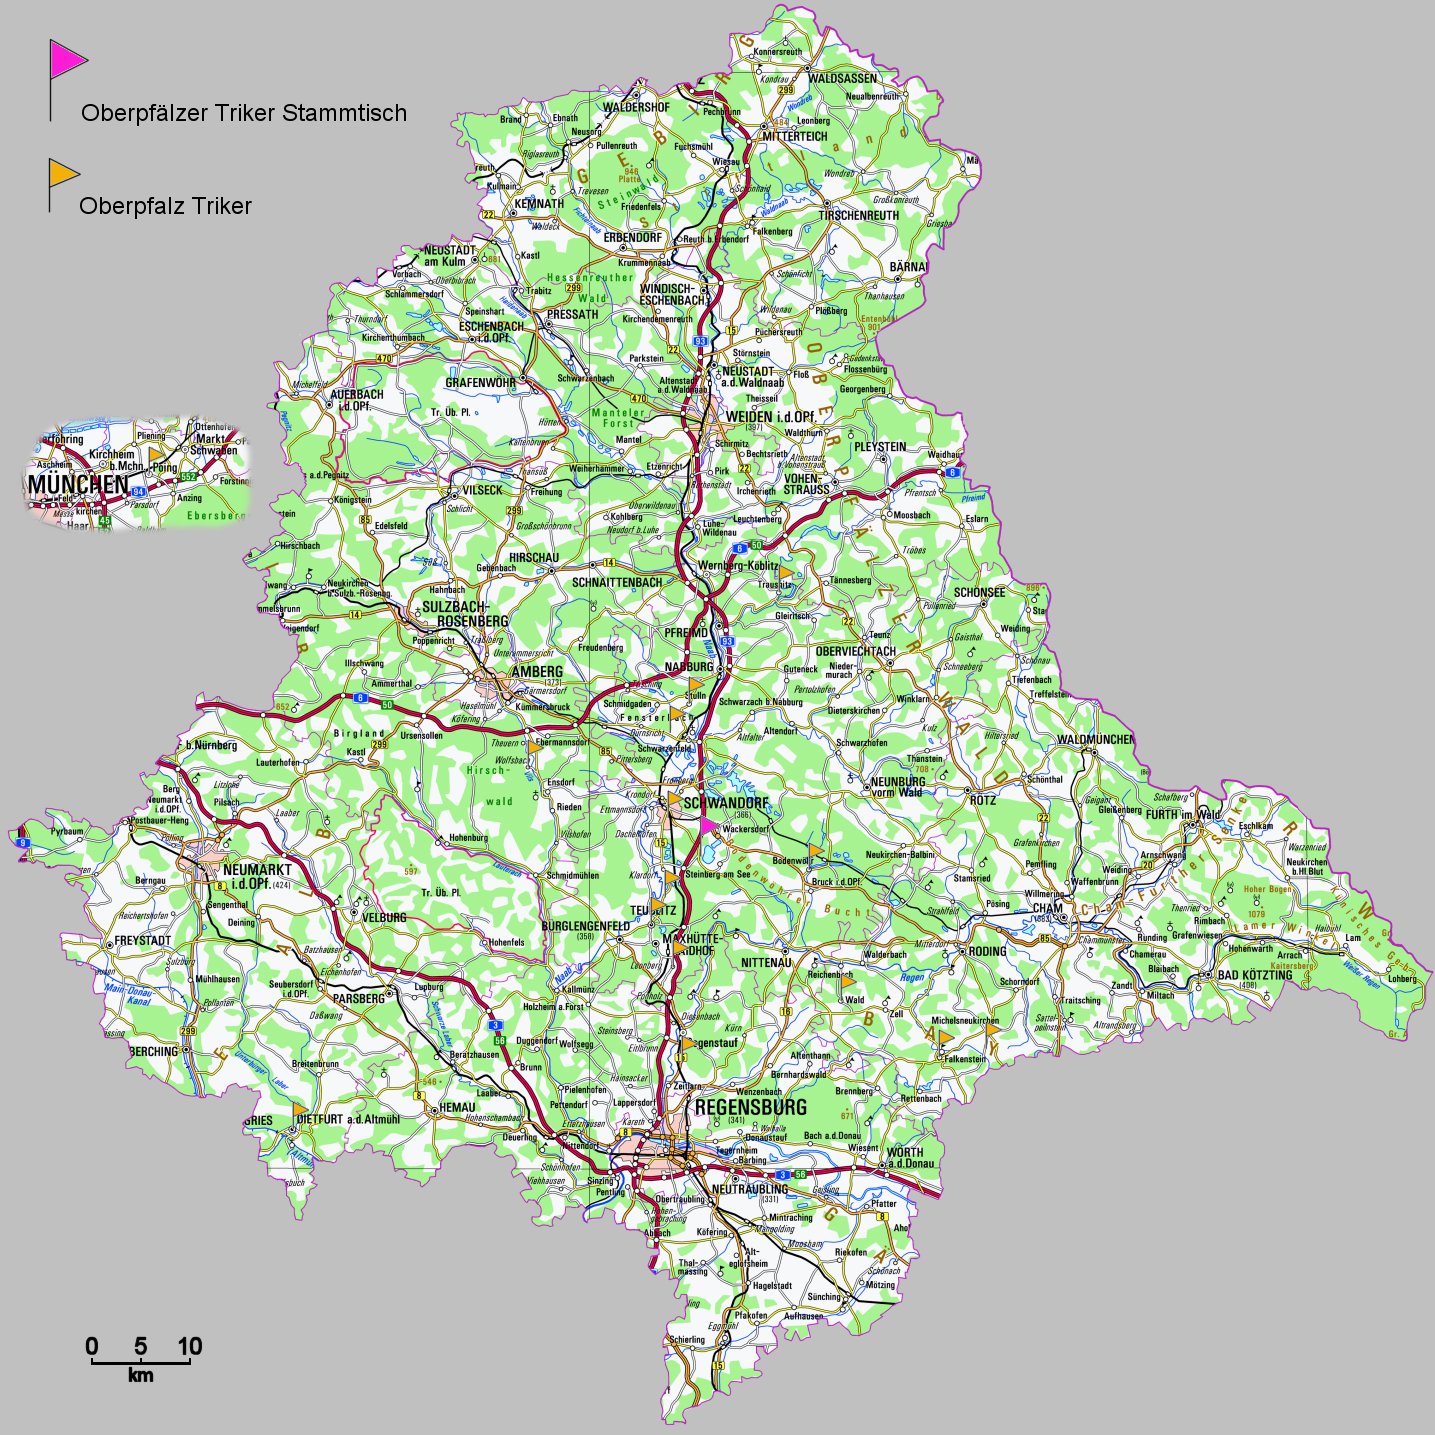 oberpfalz karte Oberpfalz Karte